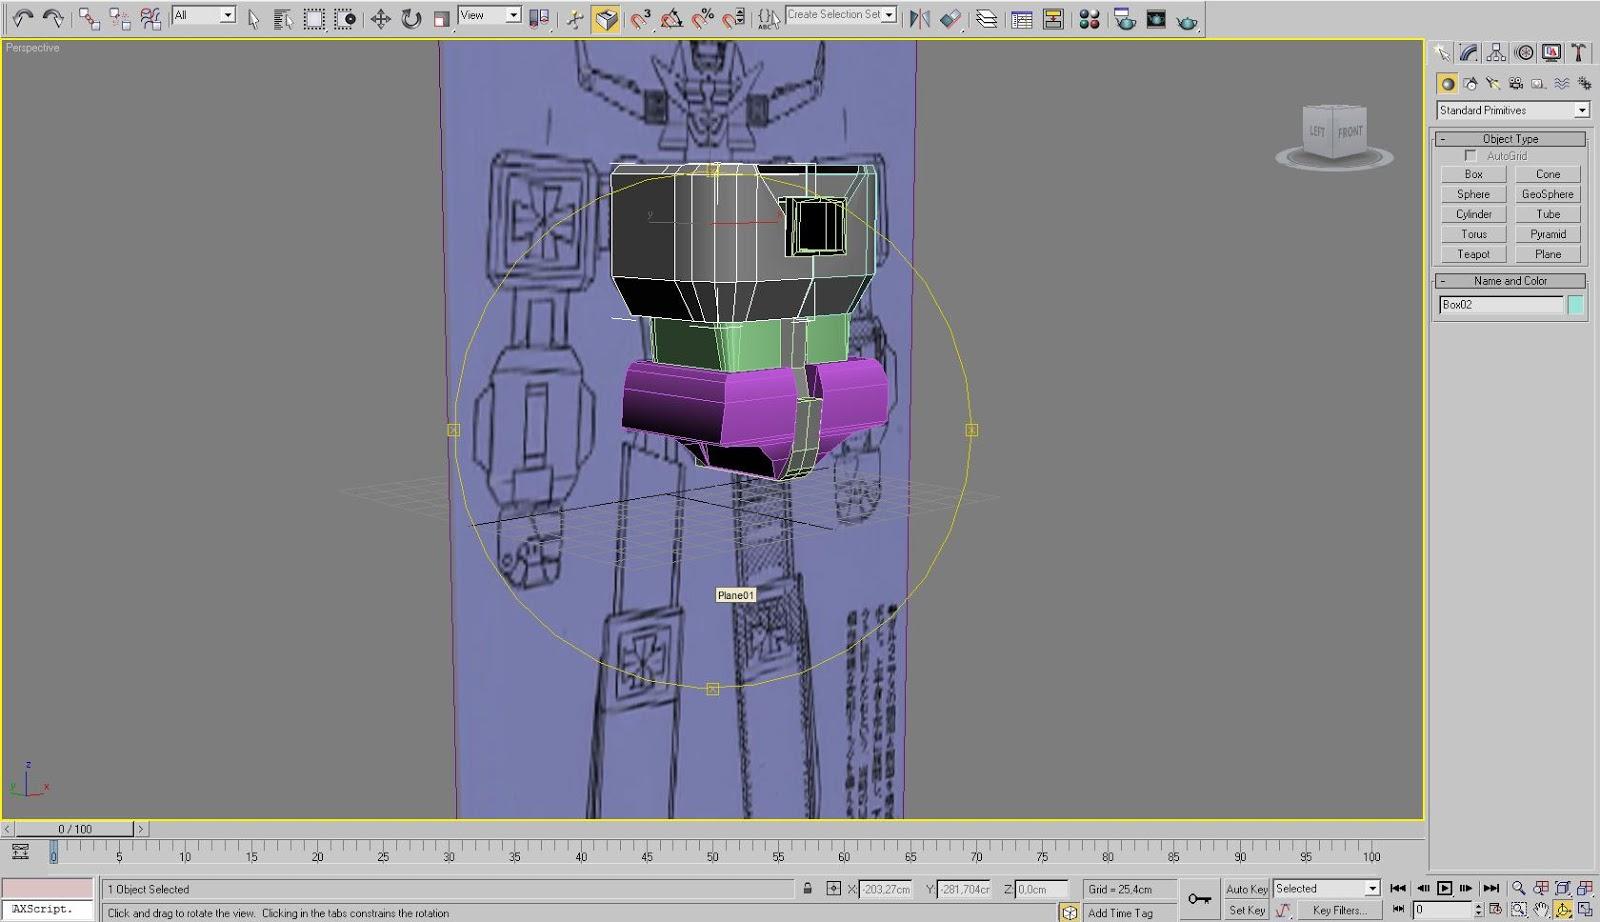 http://3.bp.blogspot.com/-NWIpZiMstas/UOxjbAghoZI/AAAAAAAAAUo/G6LQAdK_x8Y/s1600/daltanious+papercraft2.jpg